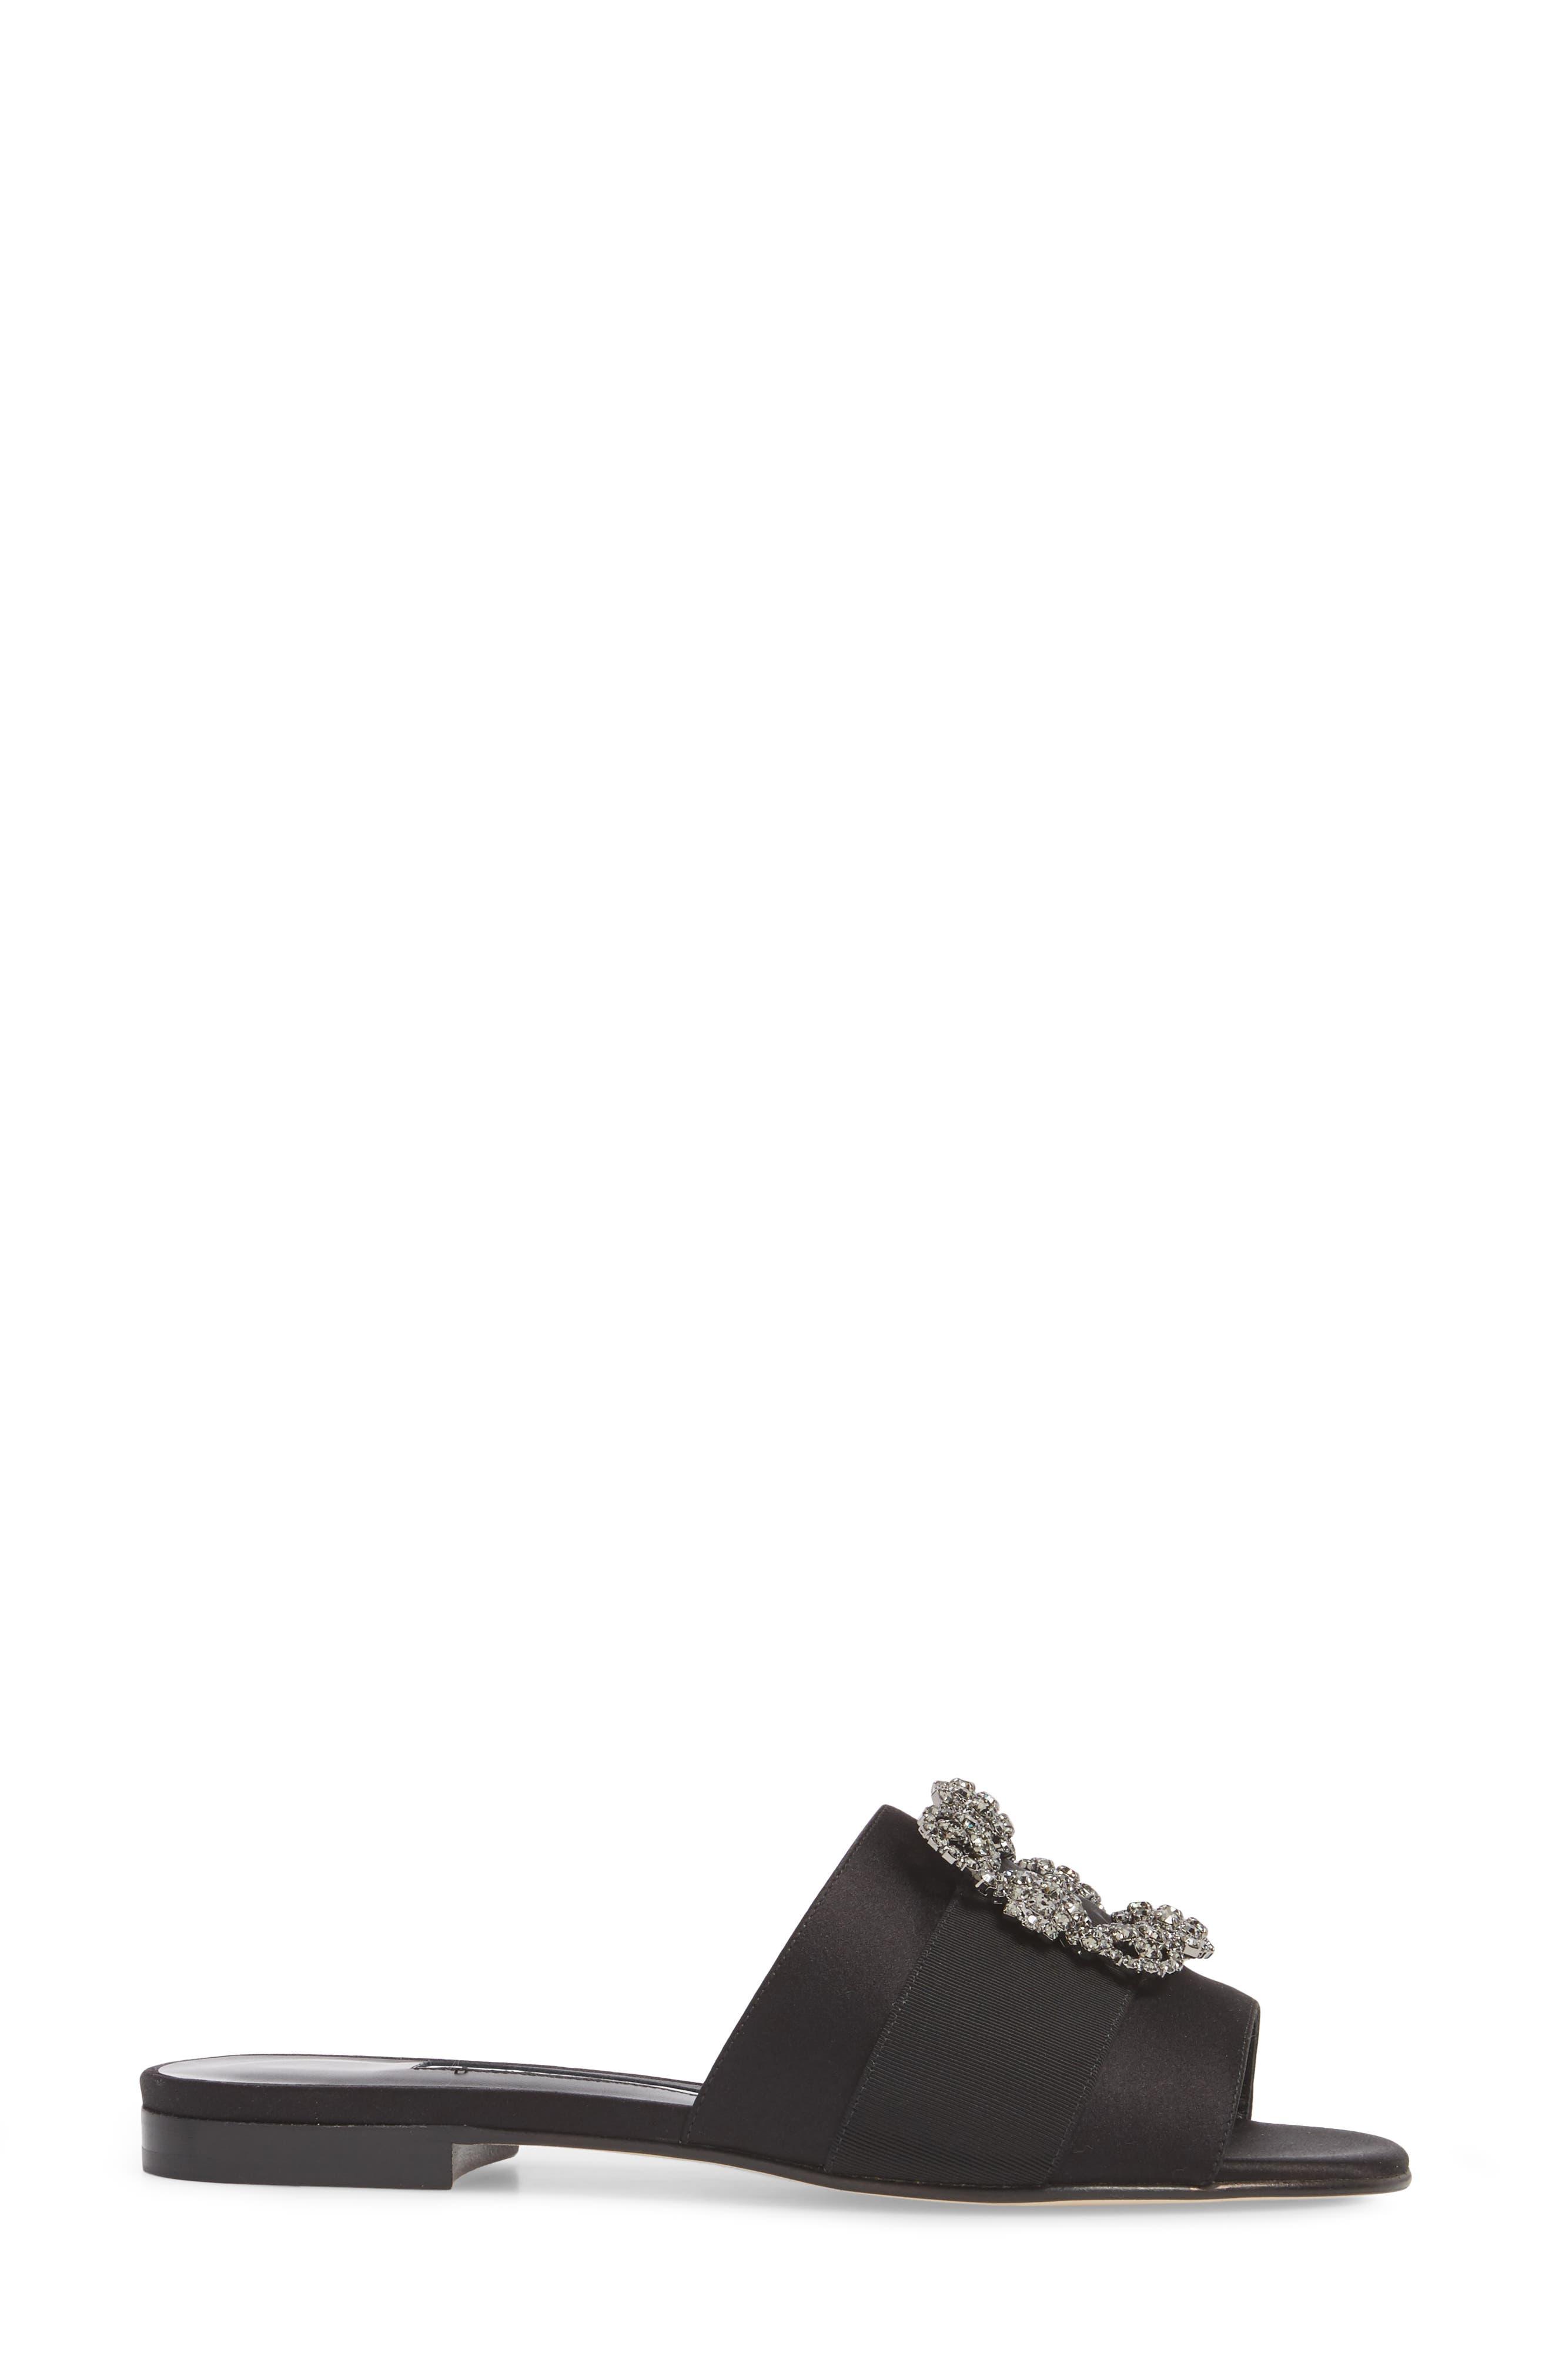 Alternate Image 3  - Manolo Blahnik Martamod Crystal Embellished Slide Sandal (Women)